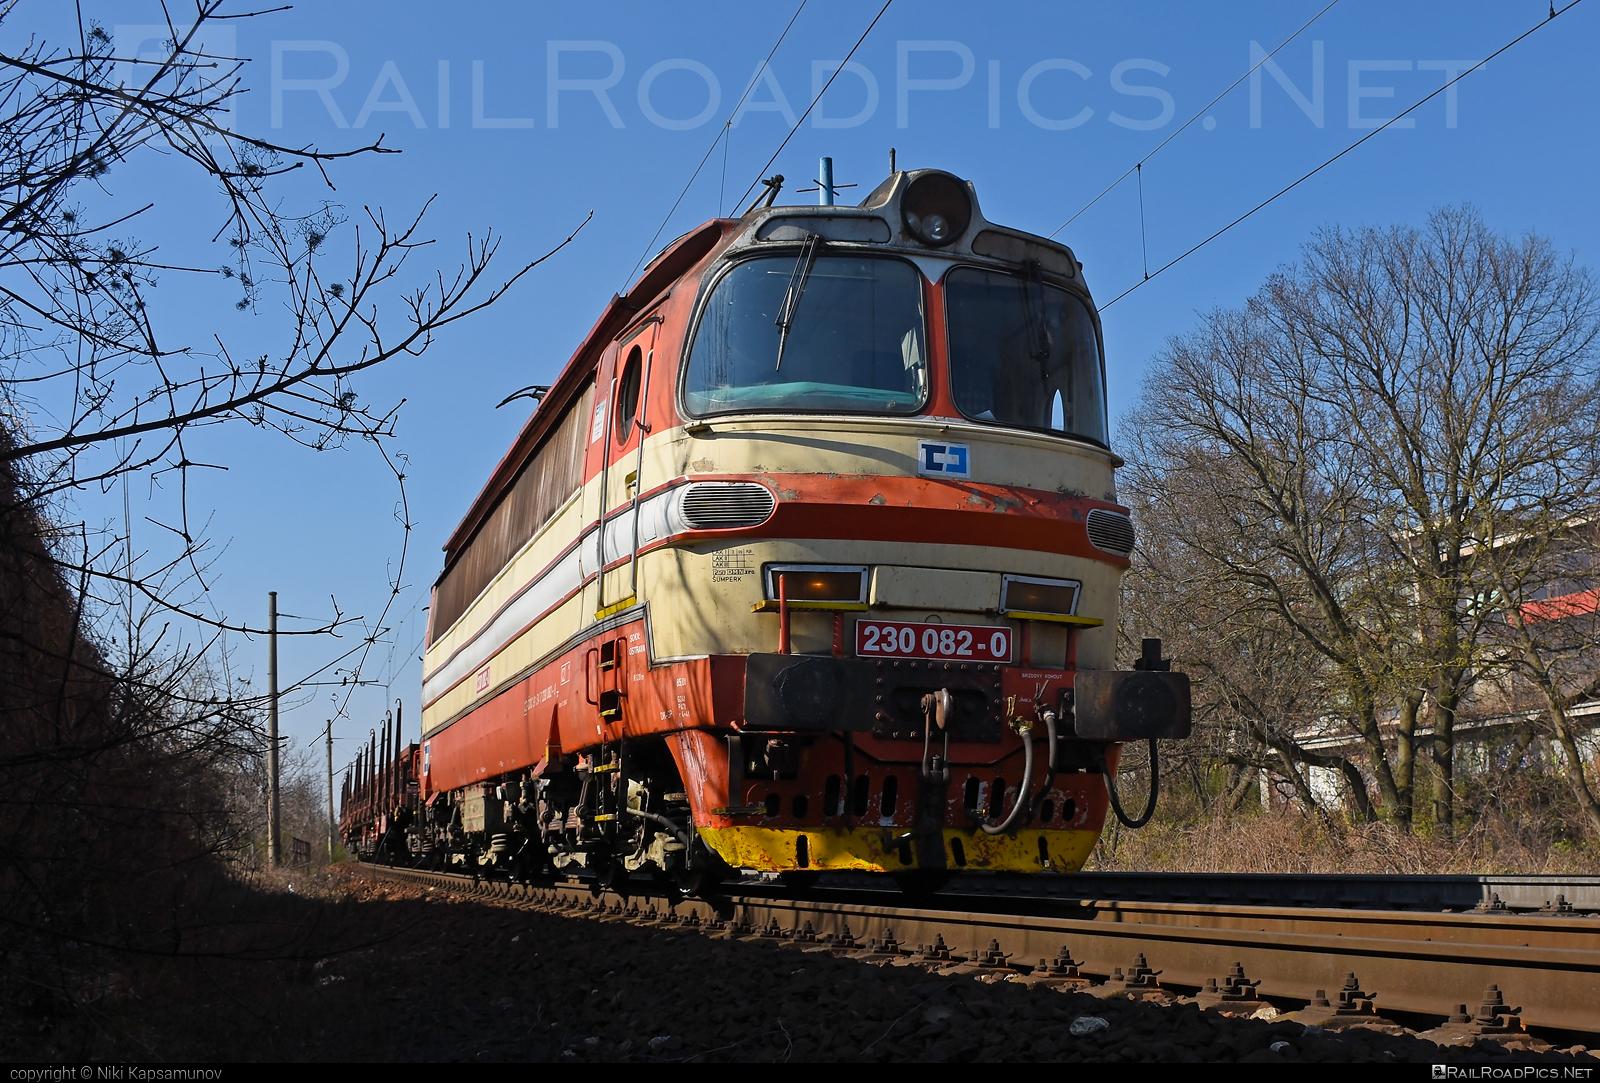 Škoda 47E - 230 082-0 operated by ČD Cargo, a.s. #cdcargo #laminatka #locomotive240 #skoda #skoda47e